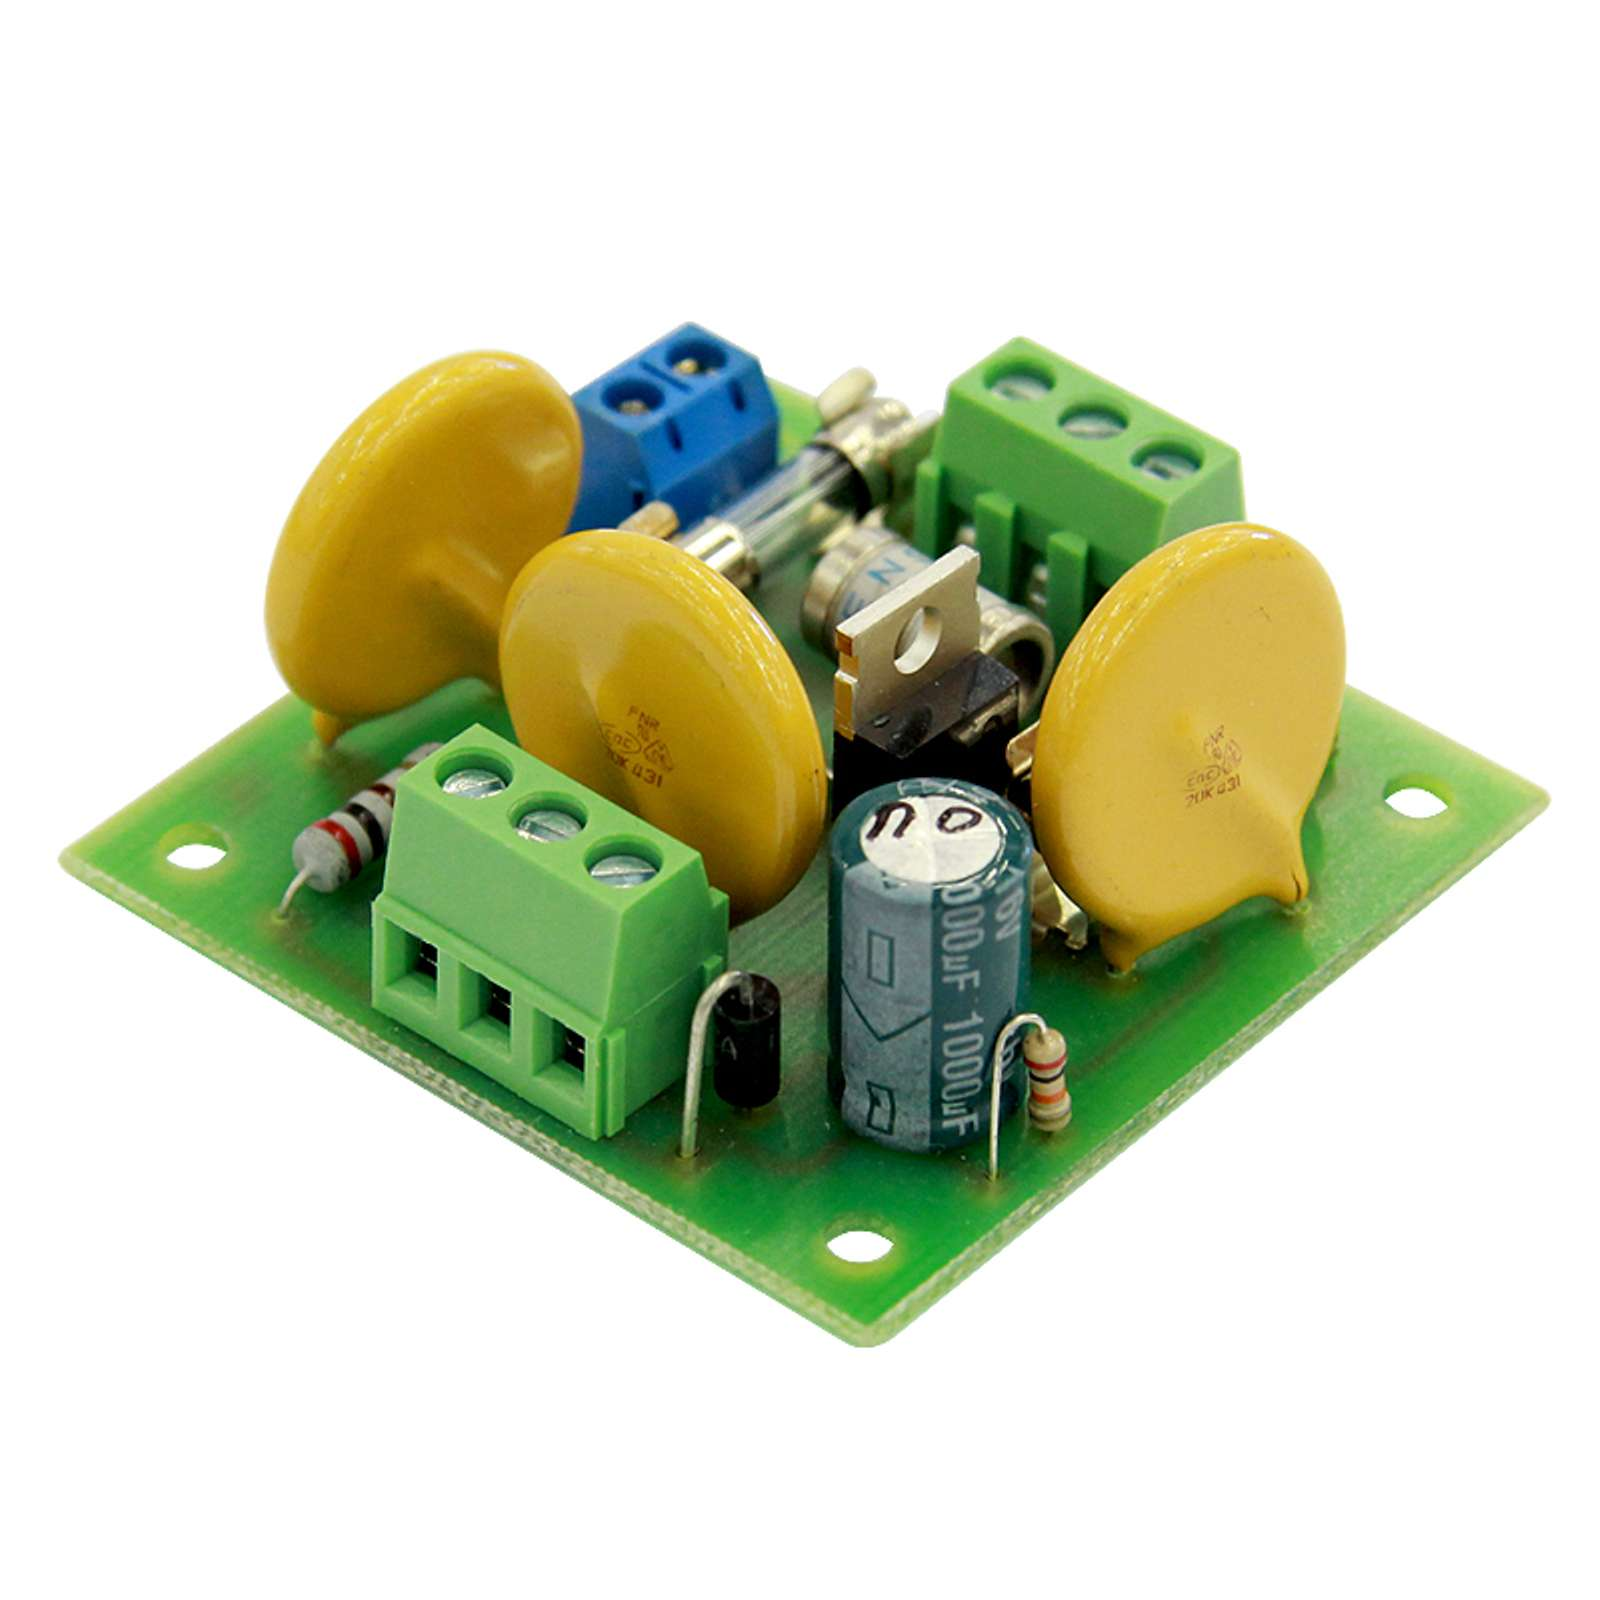 Блок защиты электросети Альбатрос-500 DIN